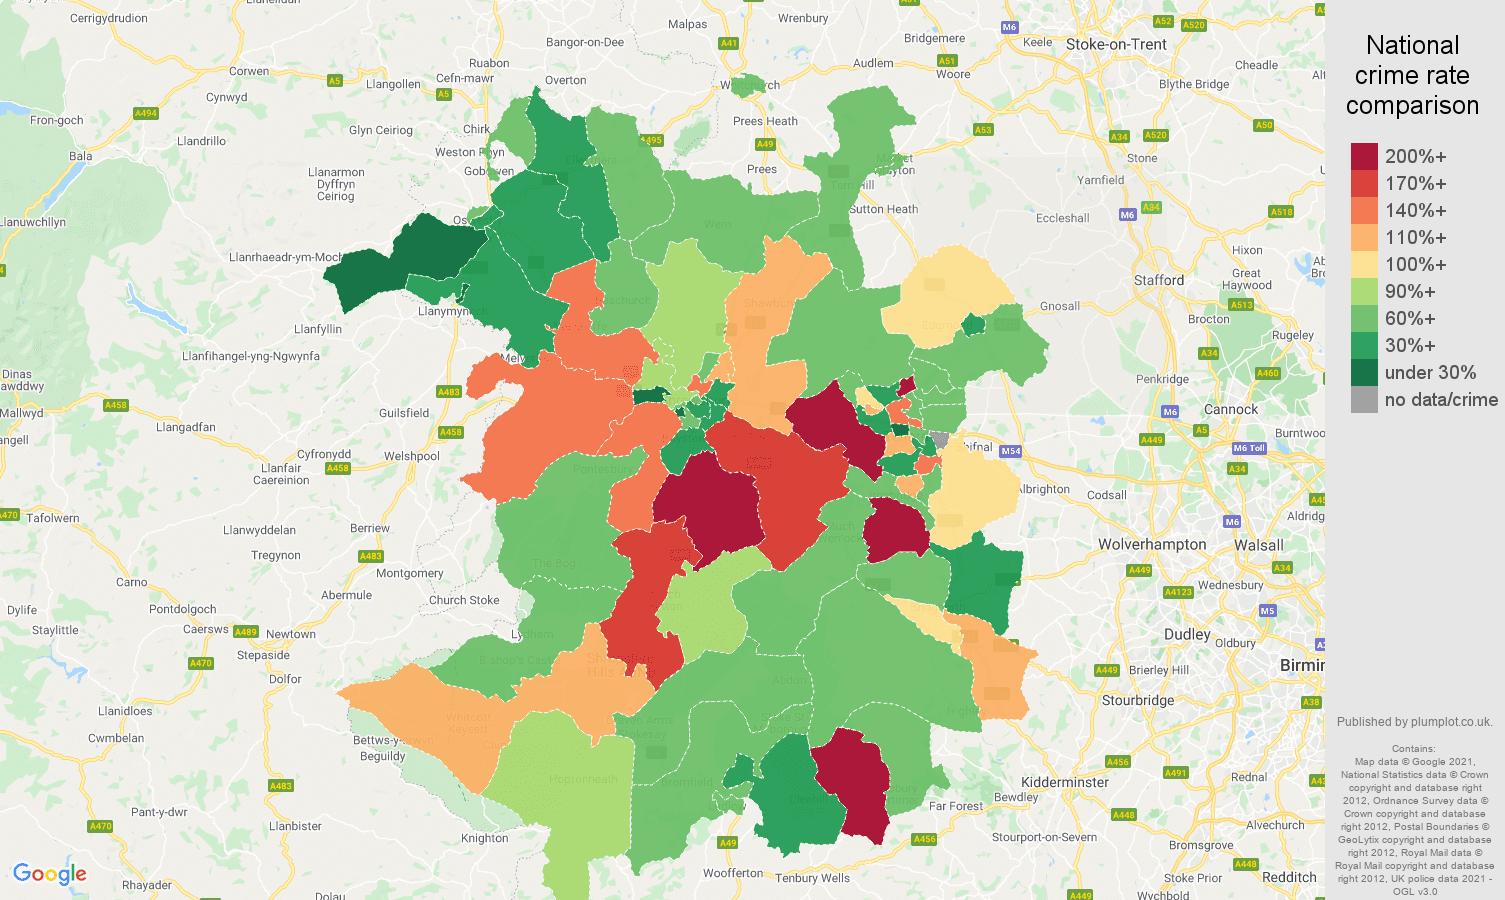 Shropshire burglary crime rate comparison map